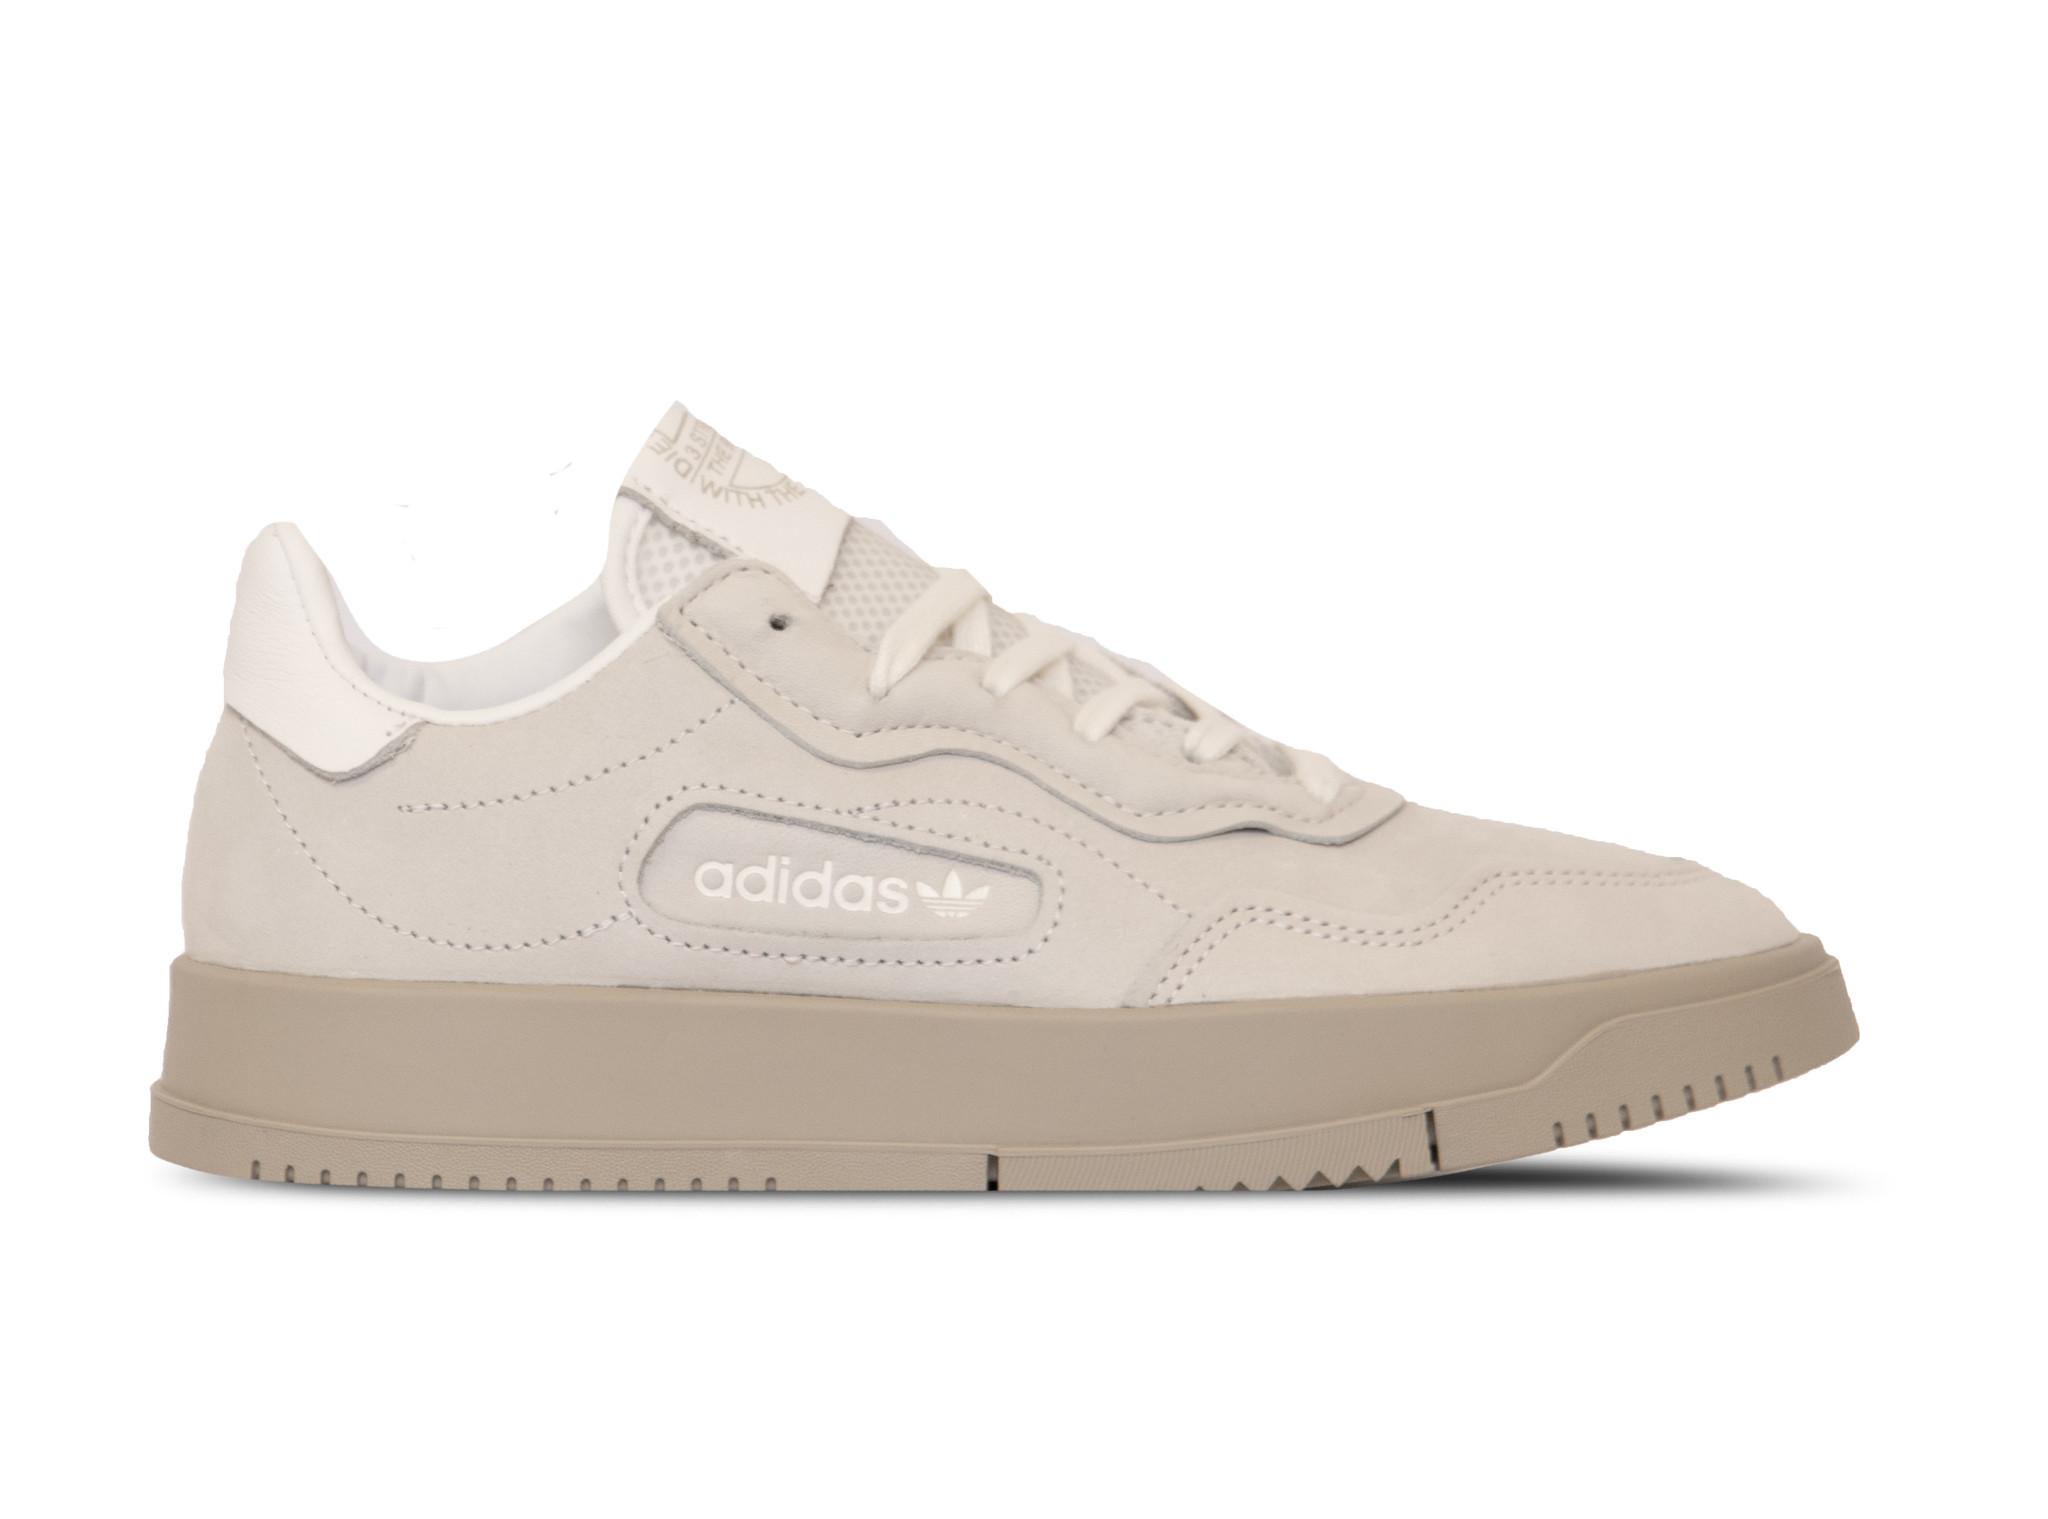 Adidas SC Premiere W Cloud White Light Brown EE6043| Bruut